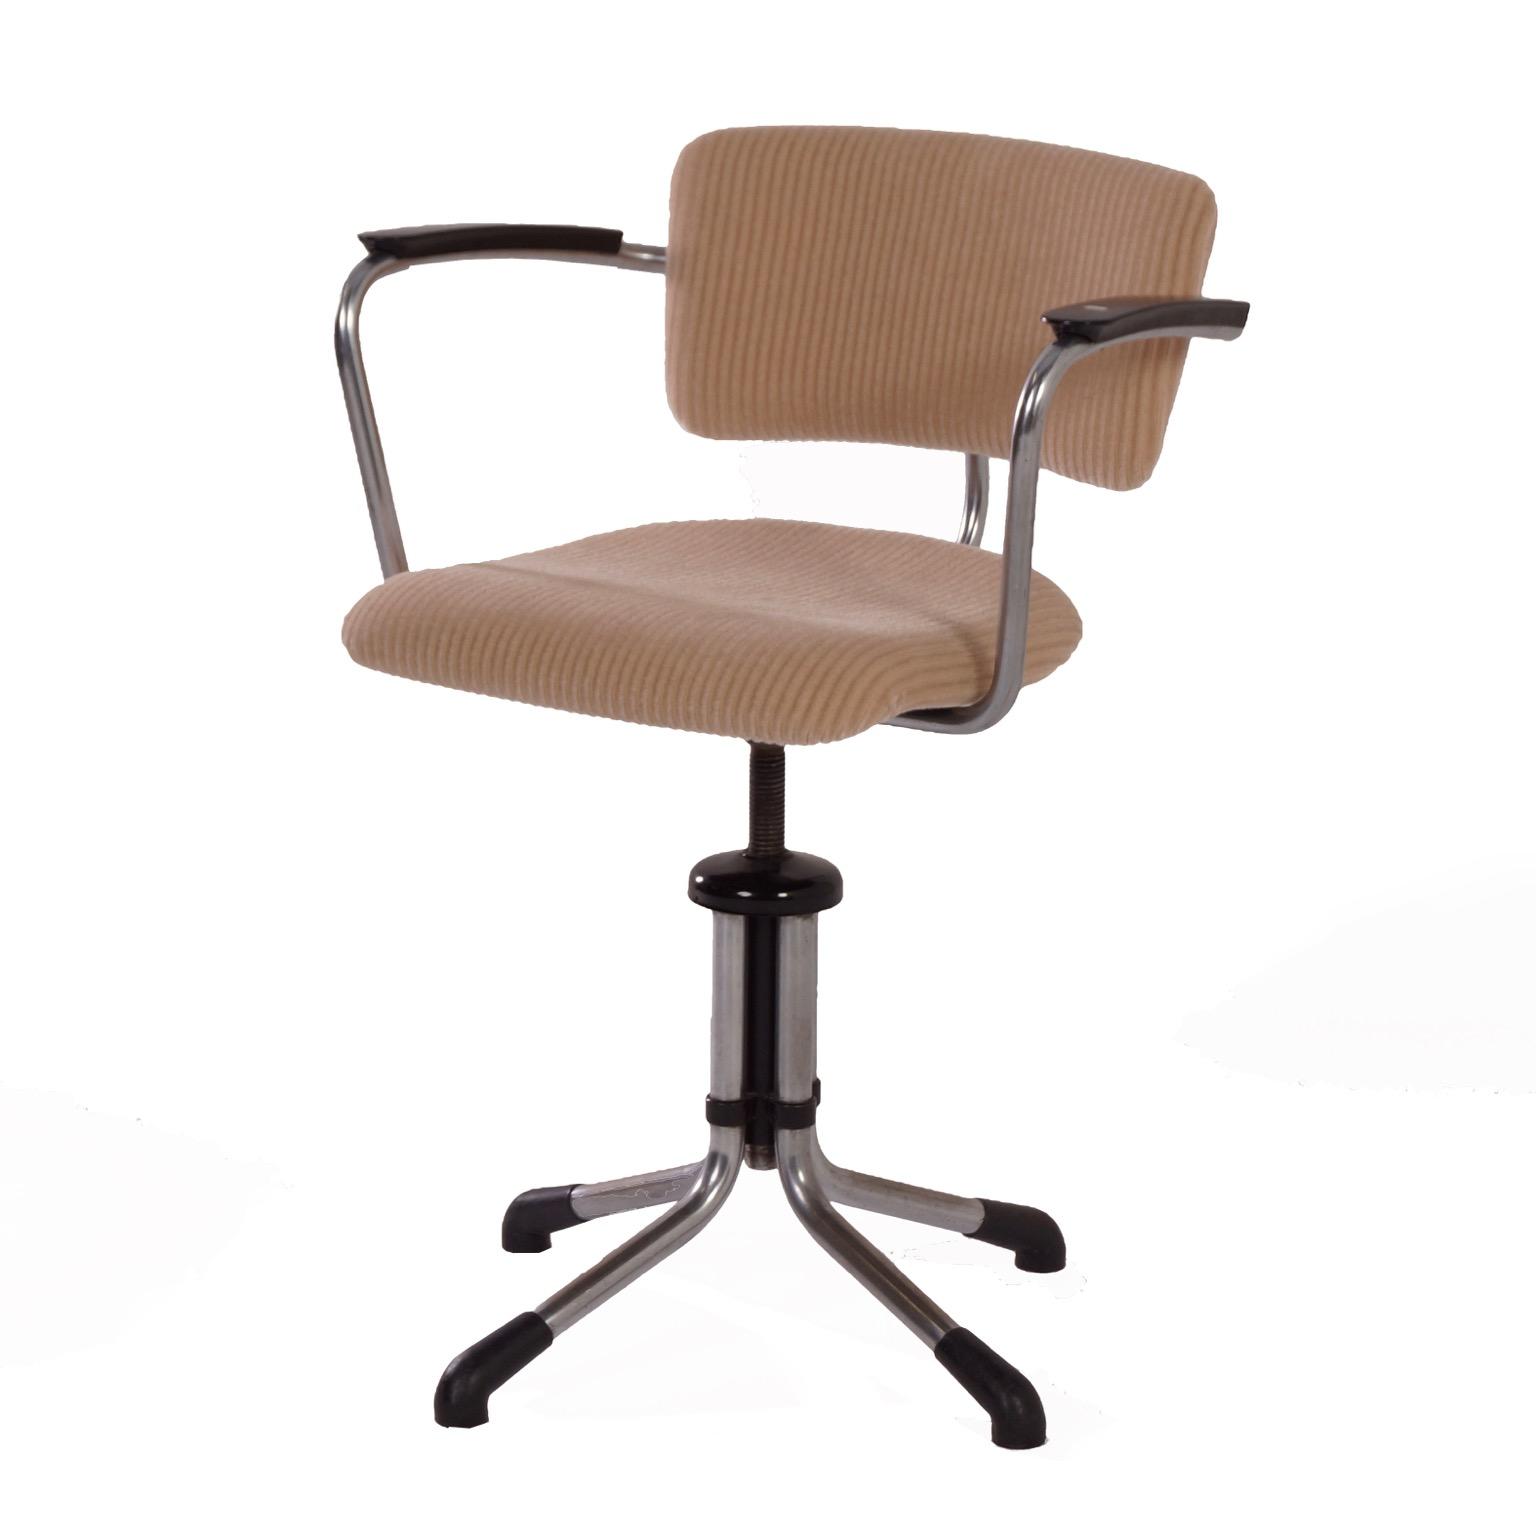 Swivel Gispen 354 Desk Chair By W H 1930s New Upholstery Mid Century